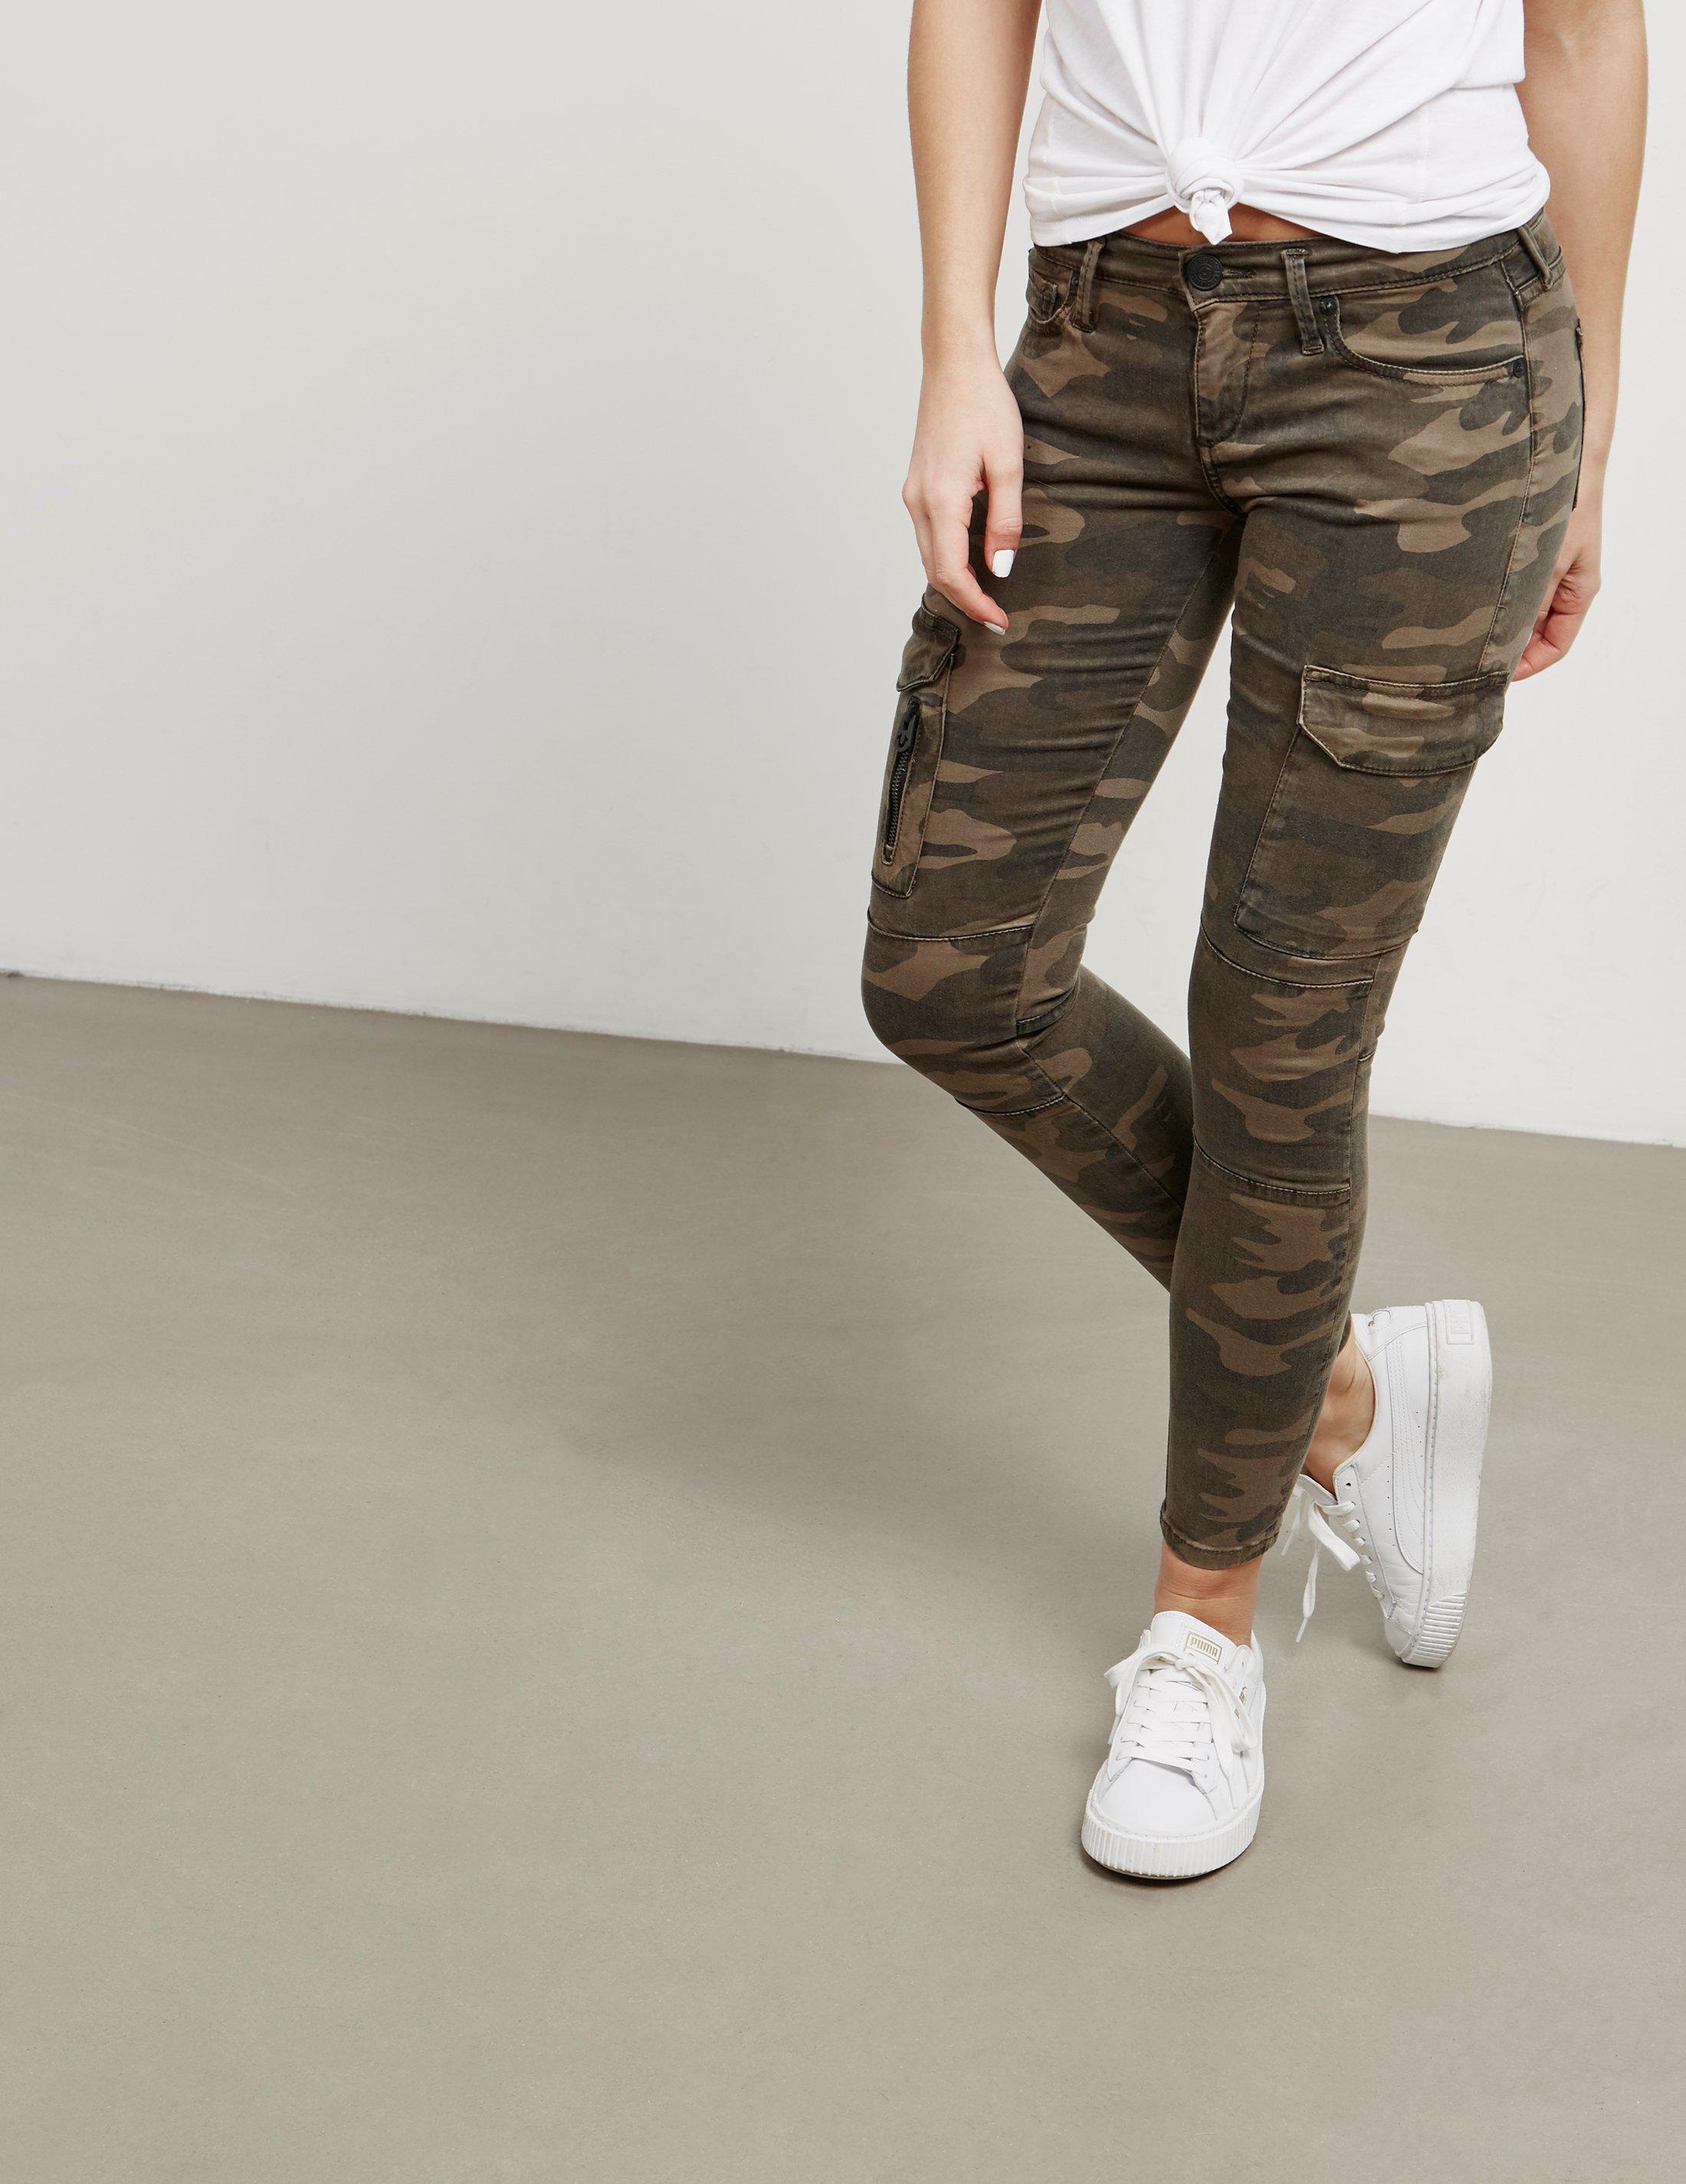 e21fe5489c2a True Religion Womens Halle Skinny Camo Cargo Jeans Camo/camo in ...